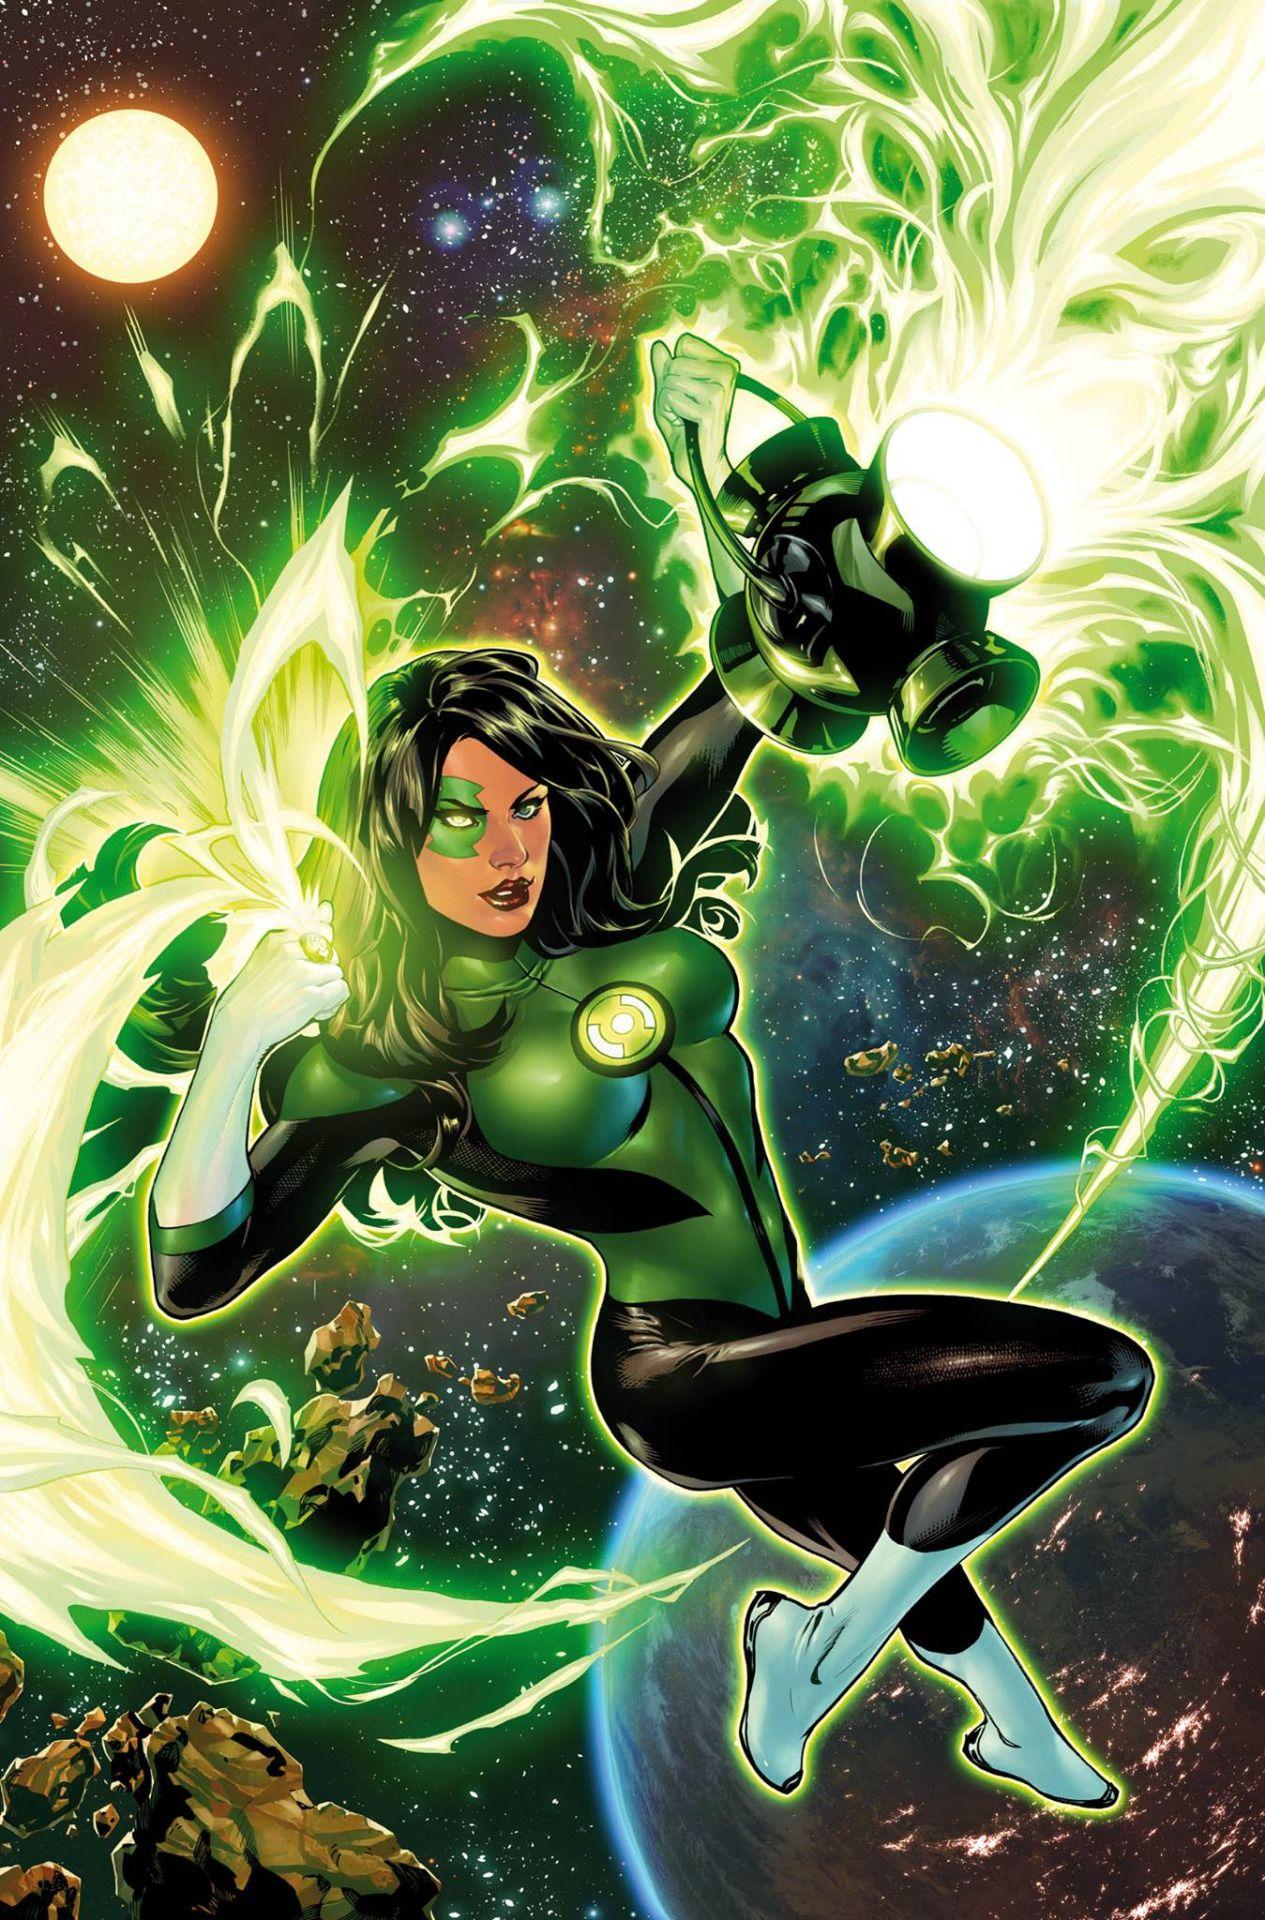 Green Lantern 2 By Emanuela Lupacchino